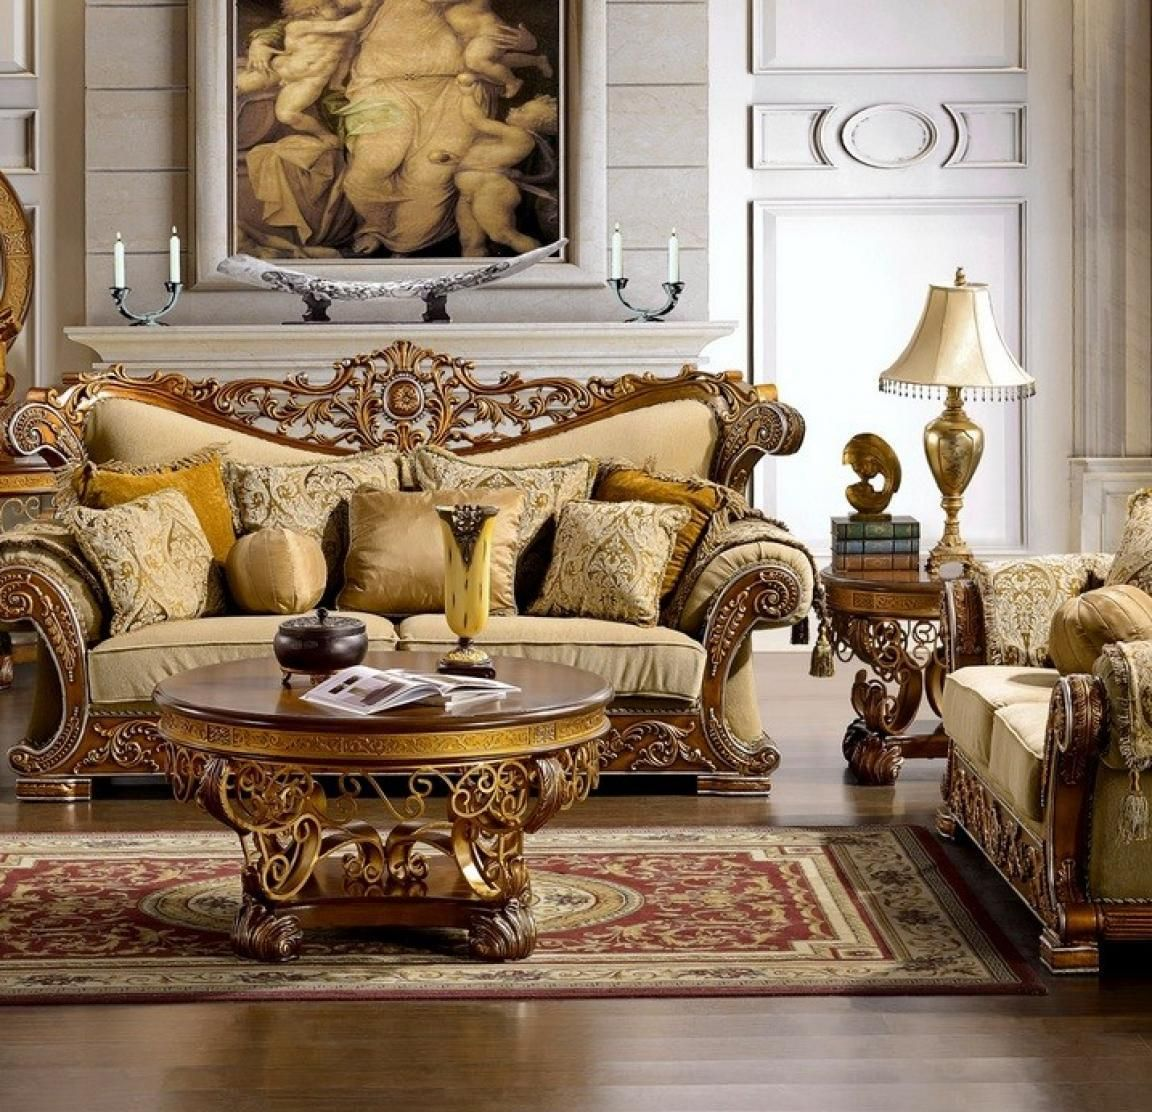 57 Enganging Luxury Living Rooms Inspirations | Elegant ...